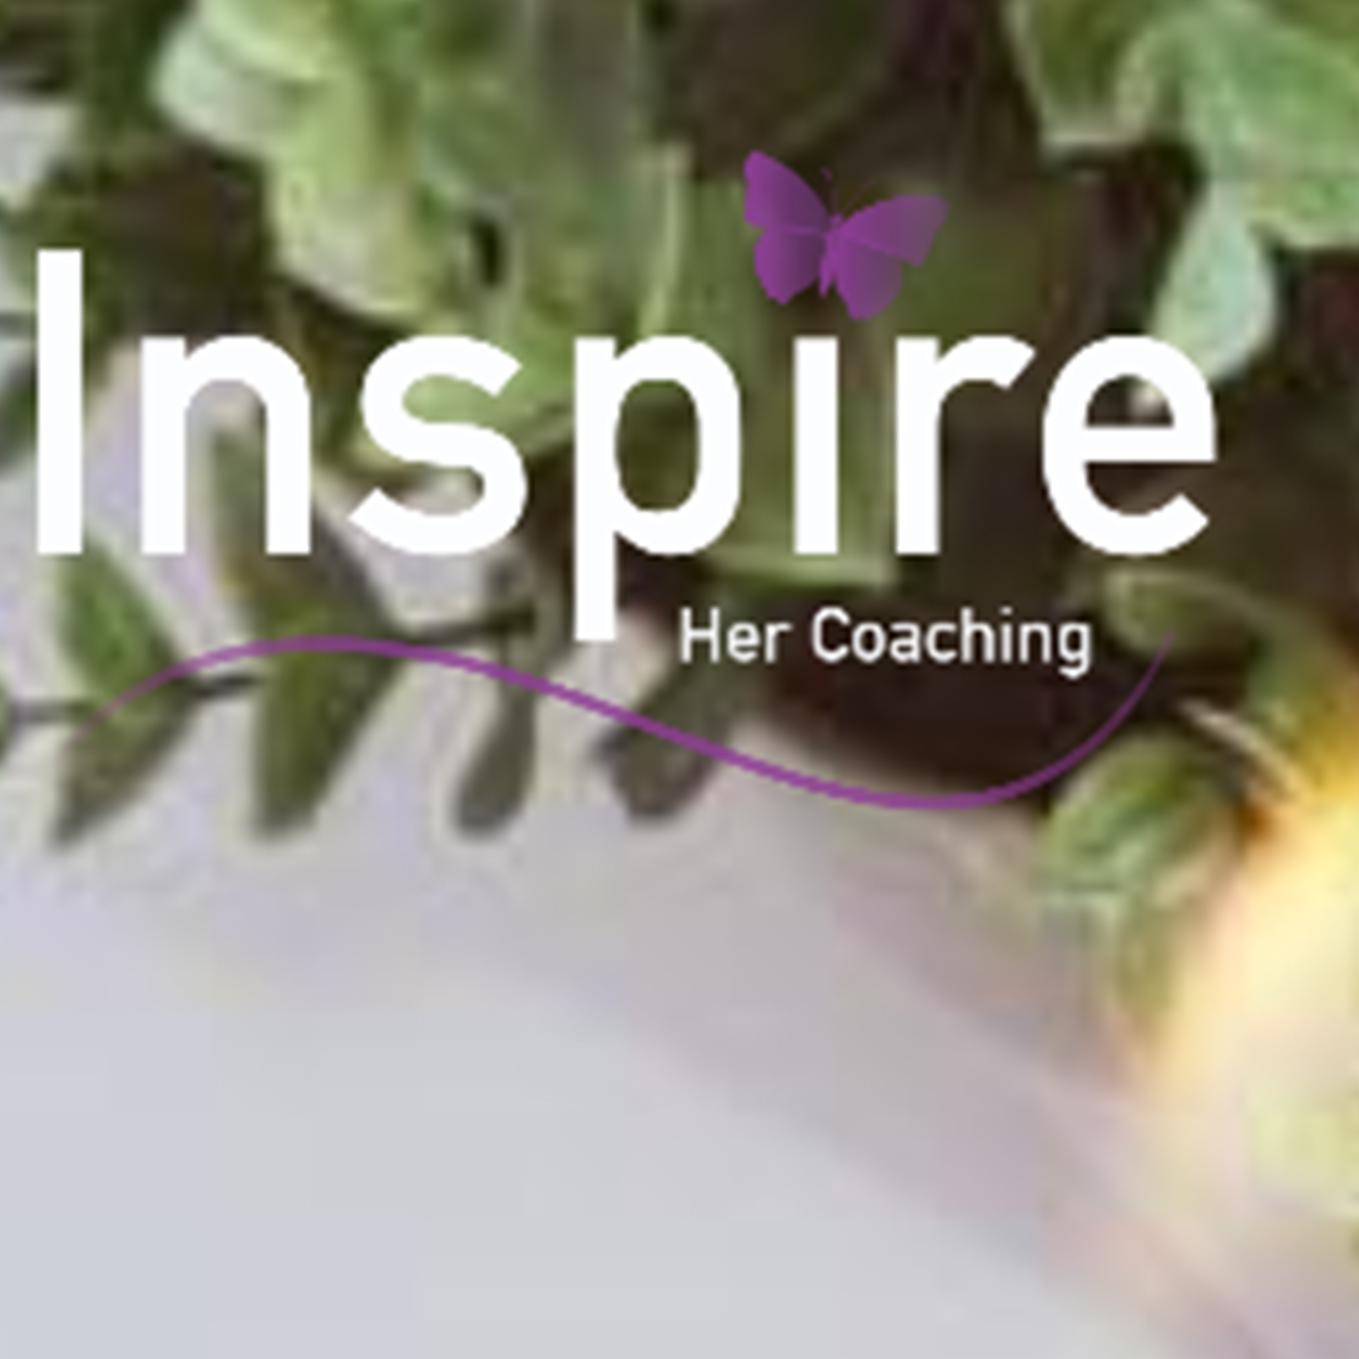 inspire her coaching testimonial